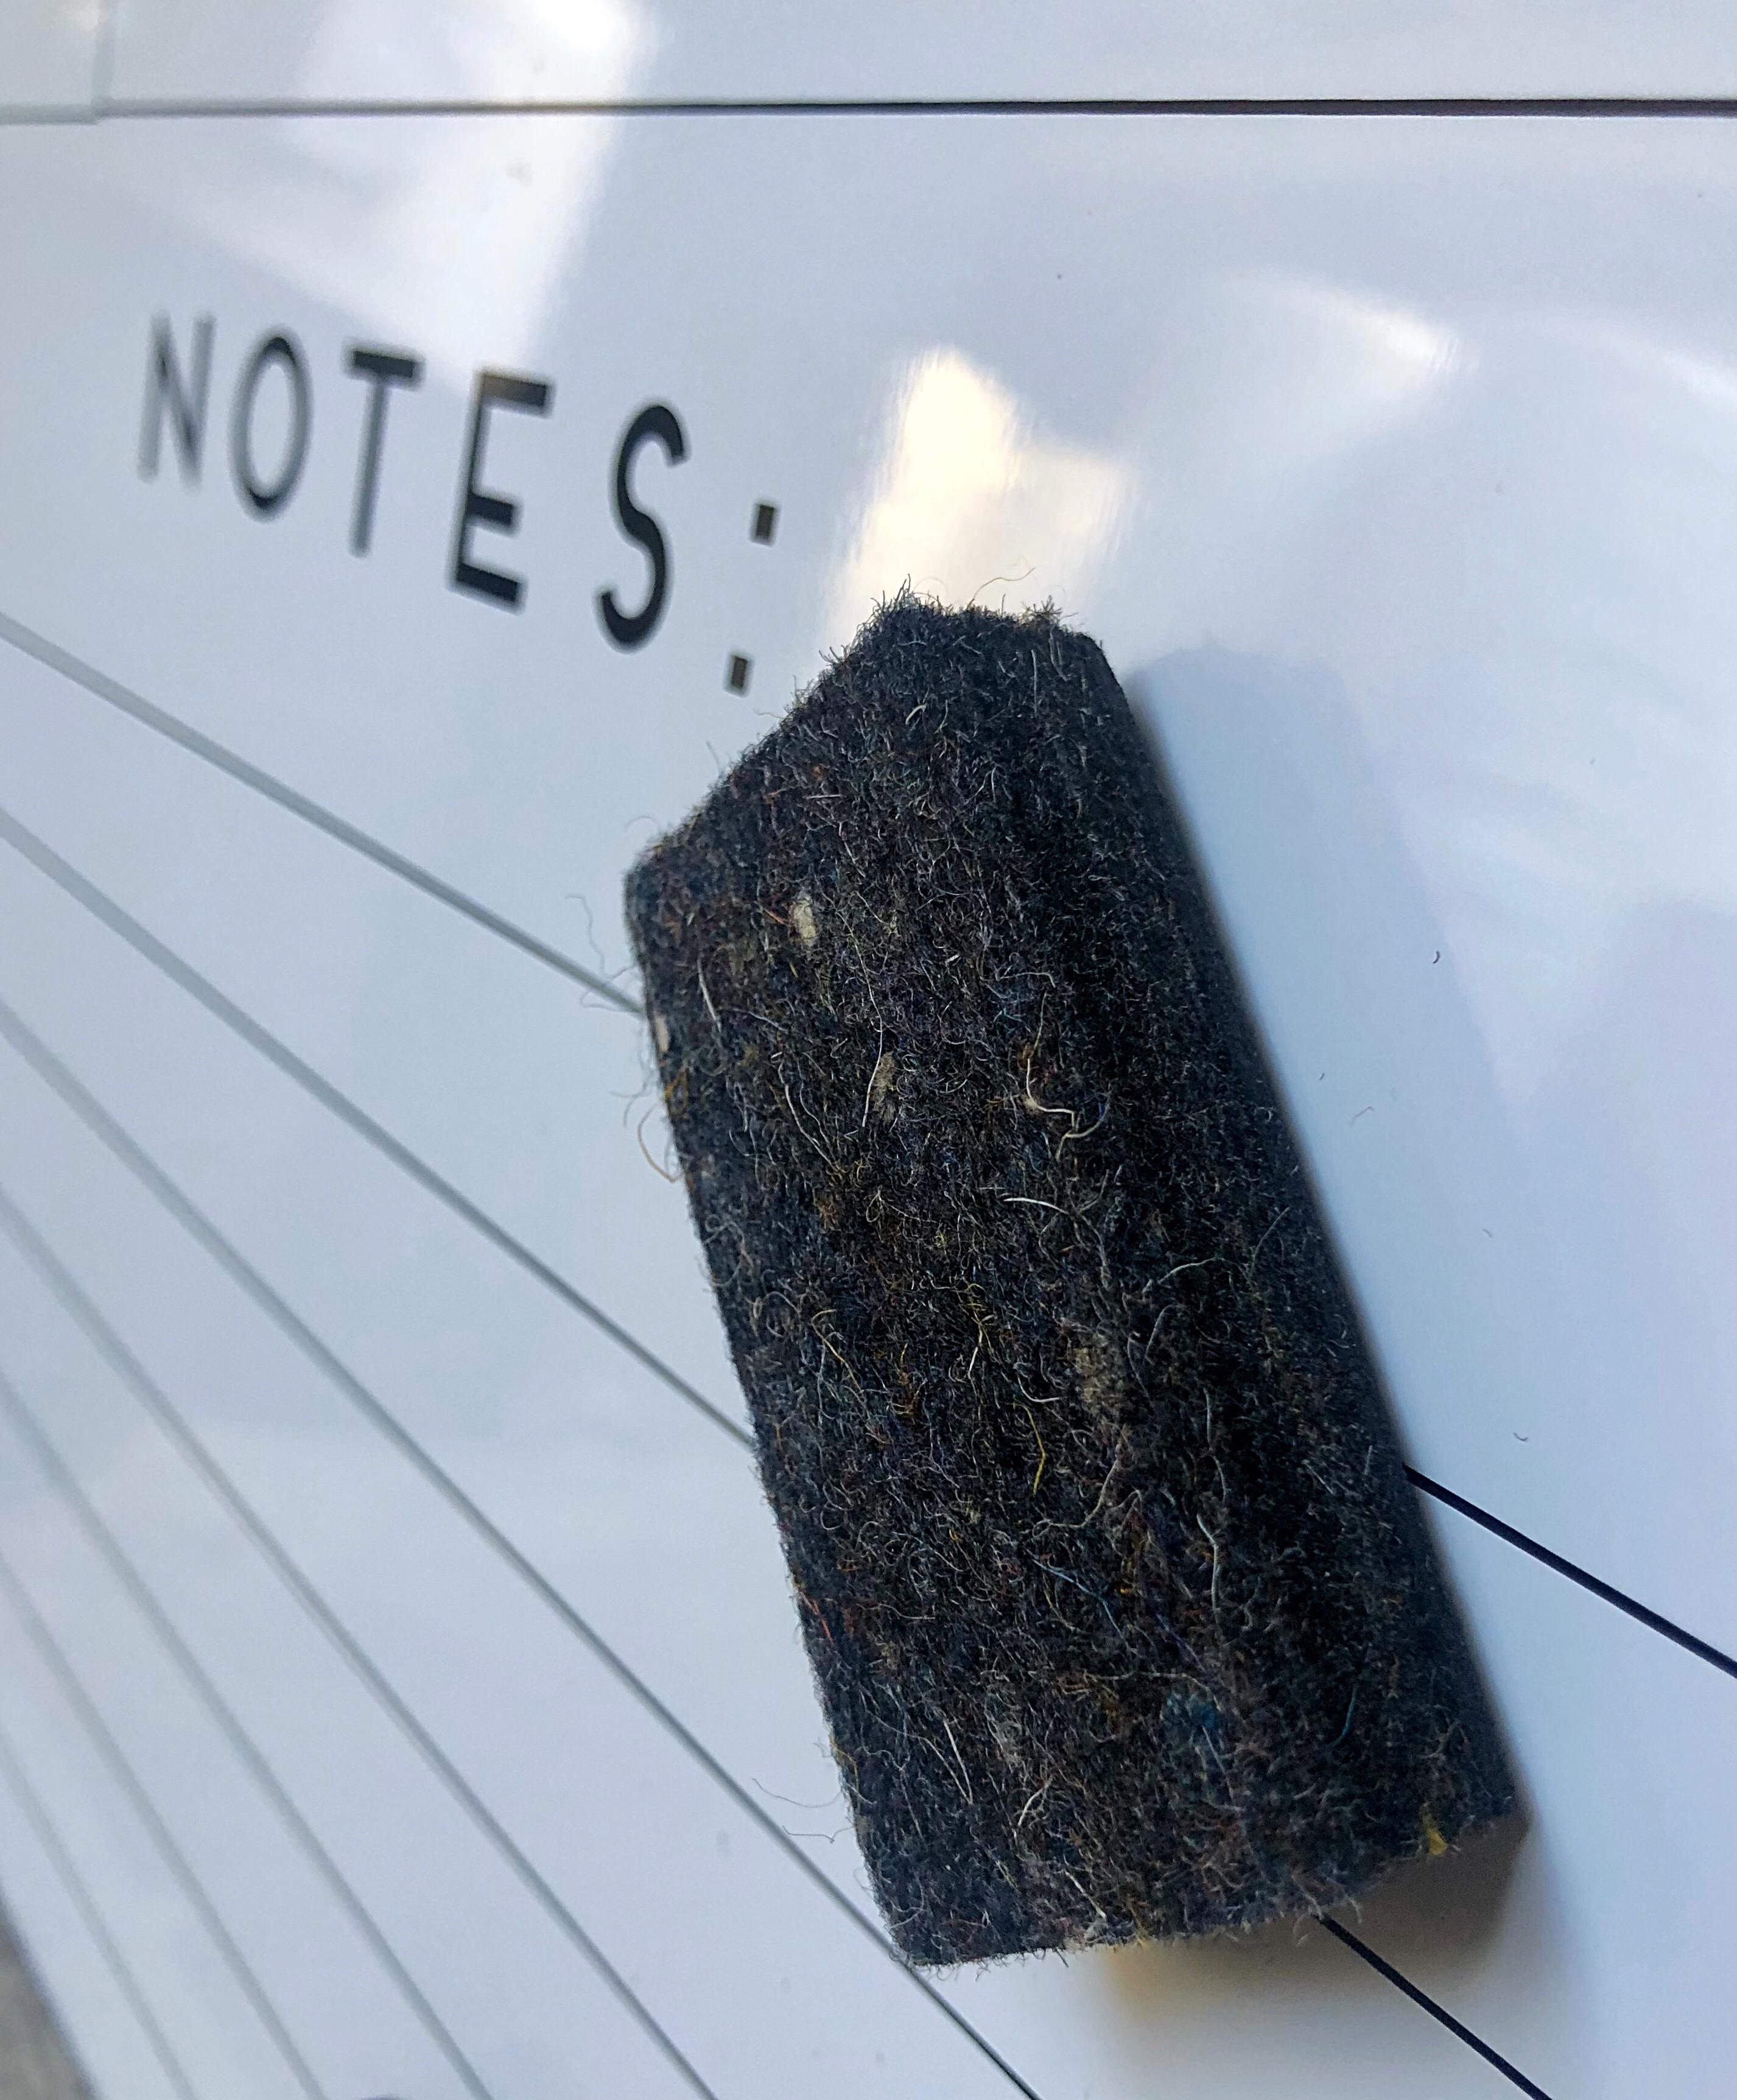 Magnetic Whiteboard Eraser Bulk Pack for School Office Training Supplies Mini Eraser Made in USA